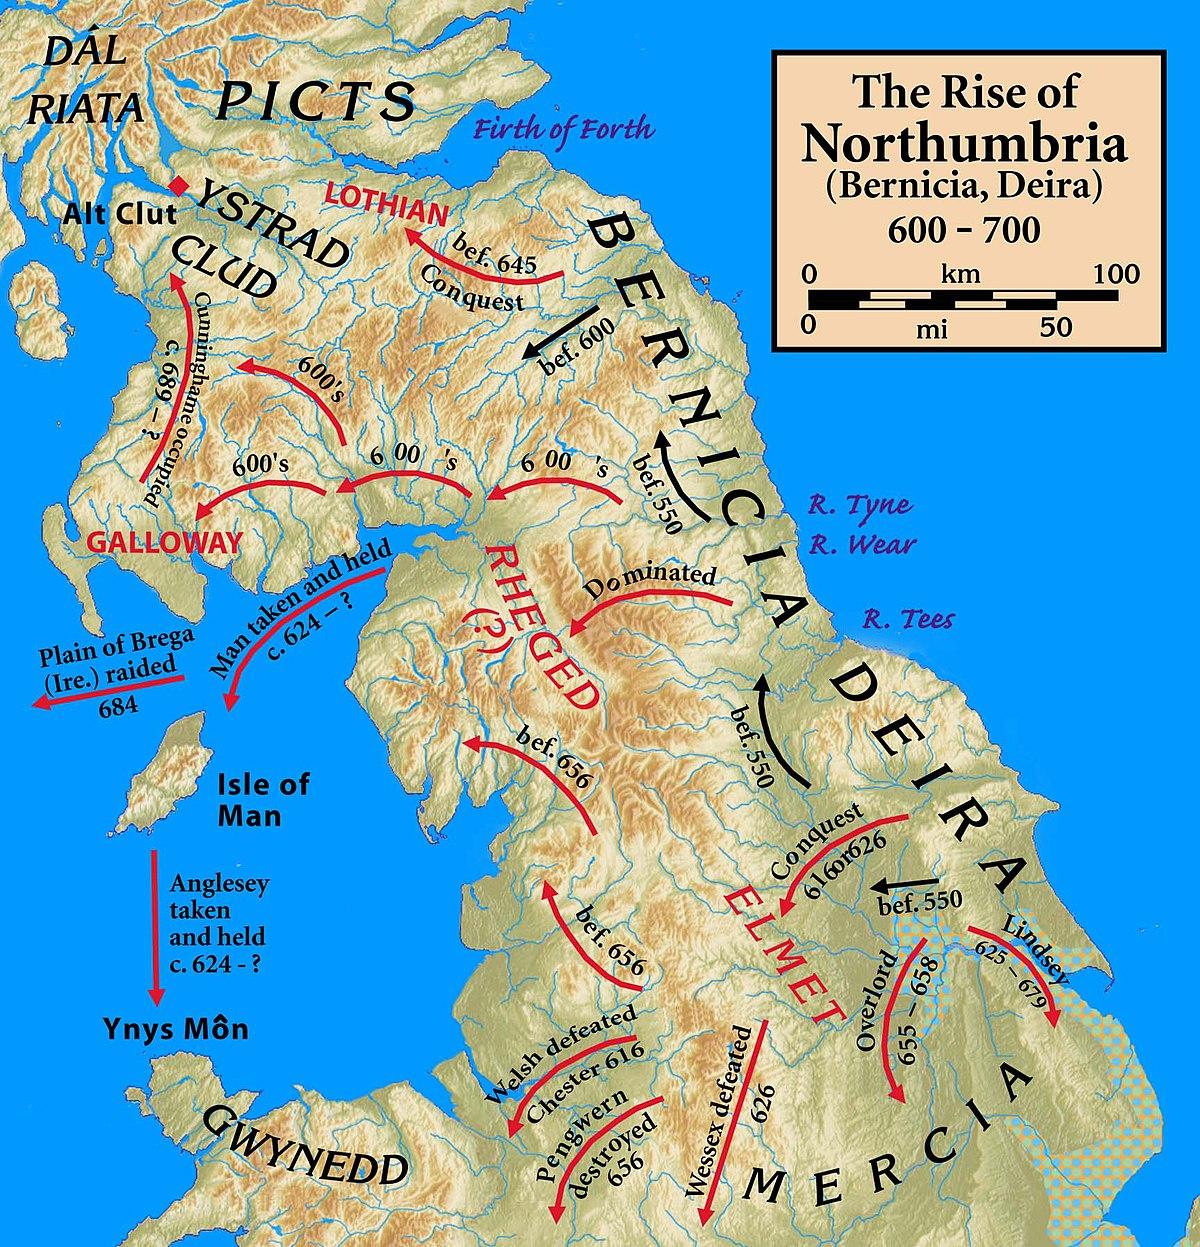 Англосаксонские королевства уэссекс суссекс эссекс мерсия нортумбрия вост англия кент